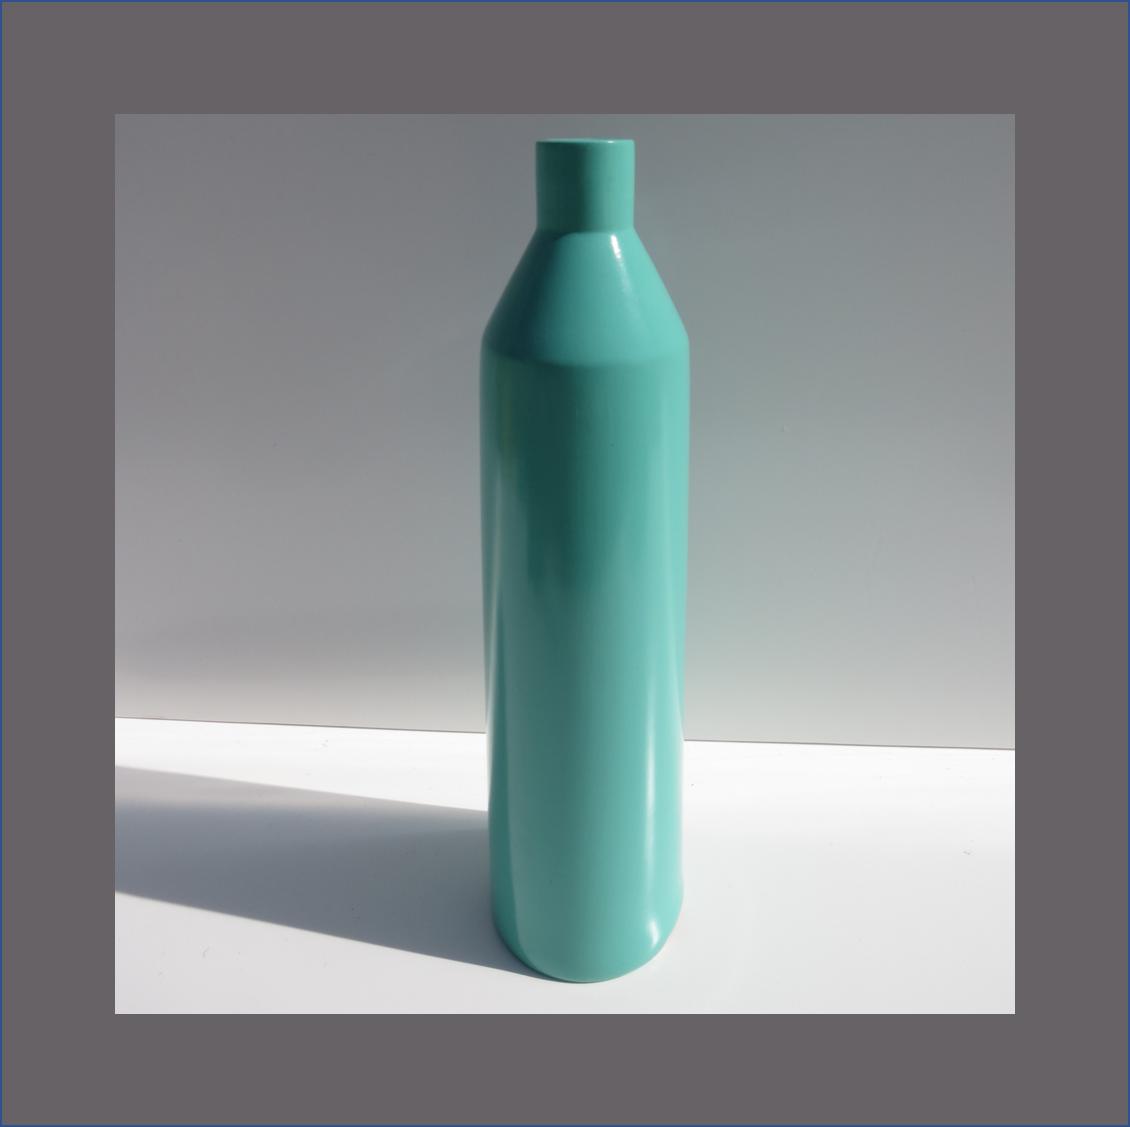 taper-tower-vase-